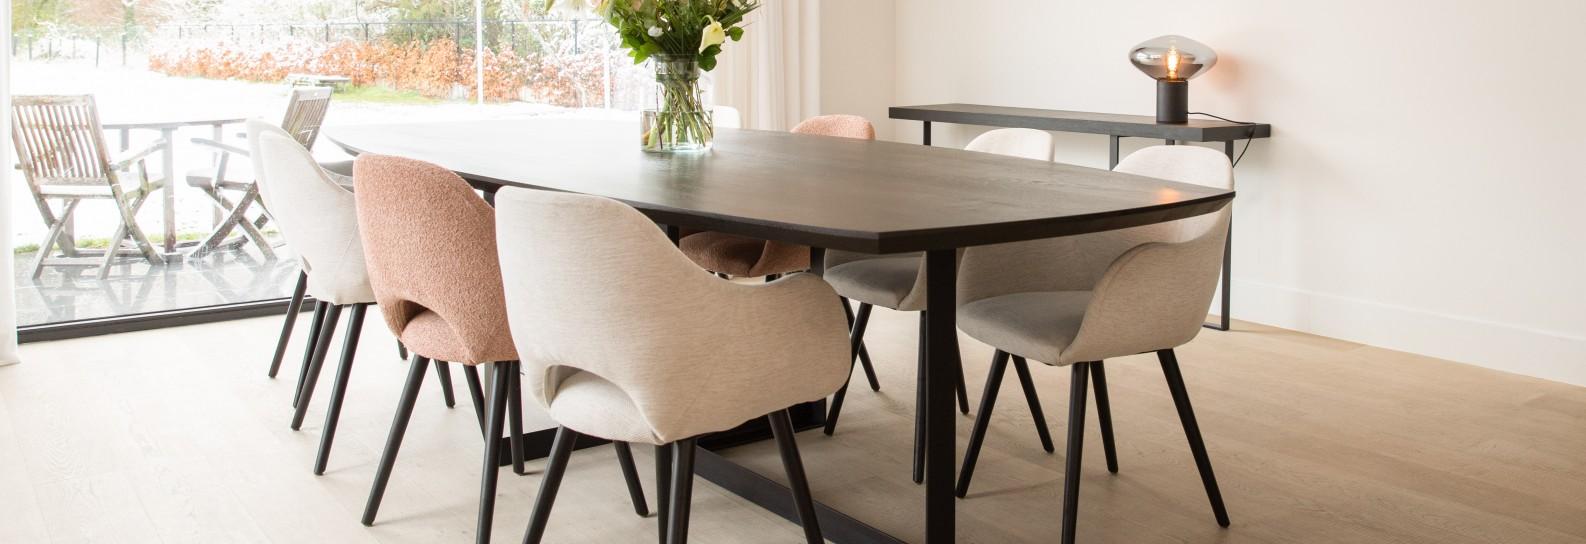 dining table Empire armchair verbier